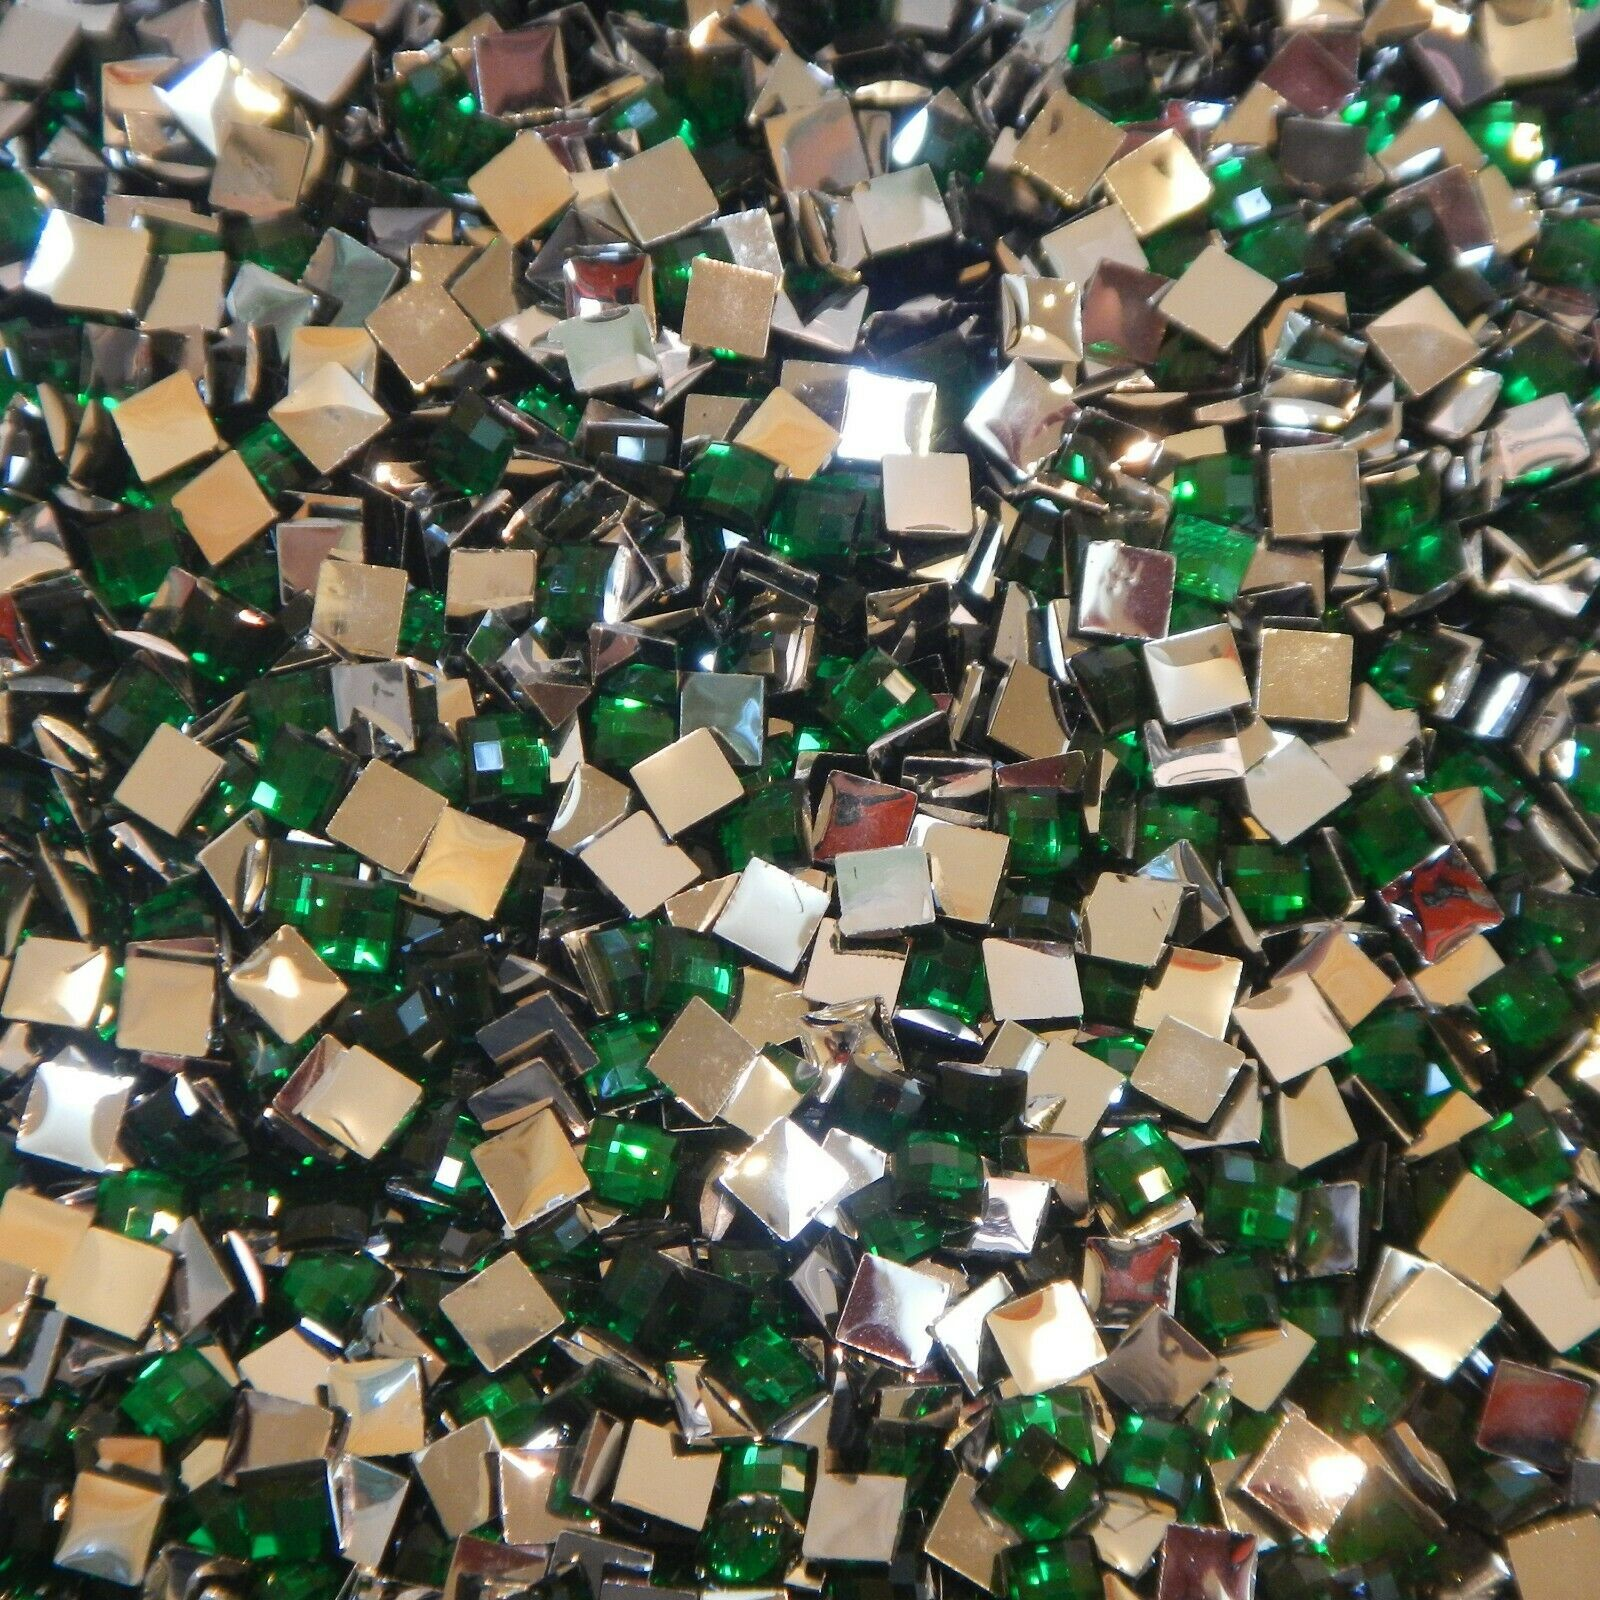 1000 Crystal Flat Back Resin Rhinestones Gems 60 colors, 2mm, 3mm, 4mm, 5mm, 6.5 SQUARE EMERALD